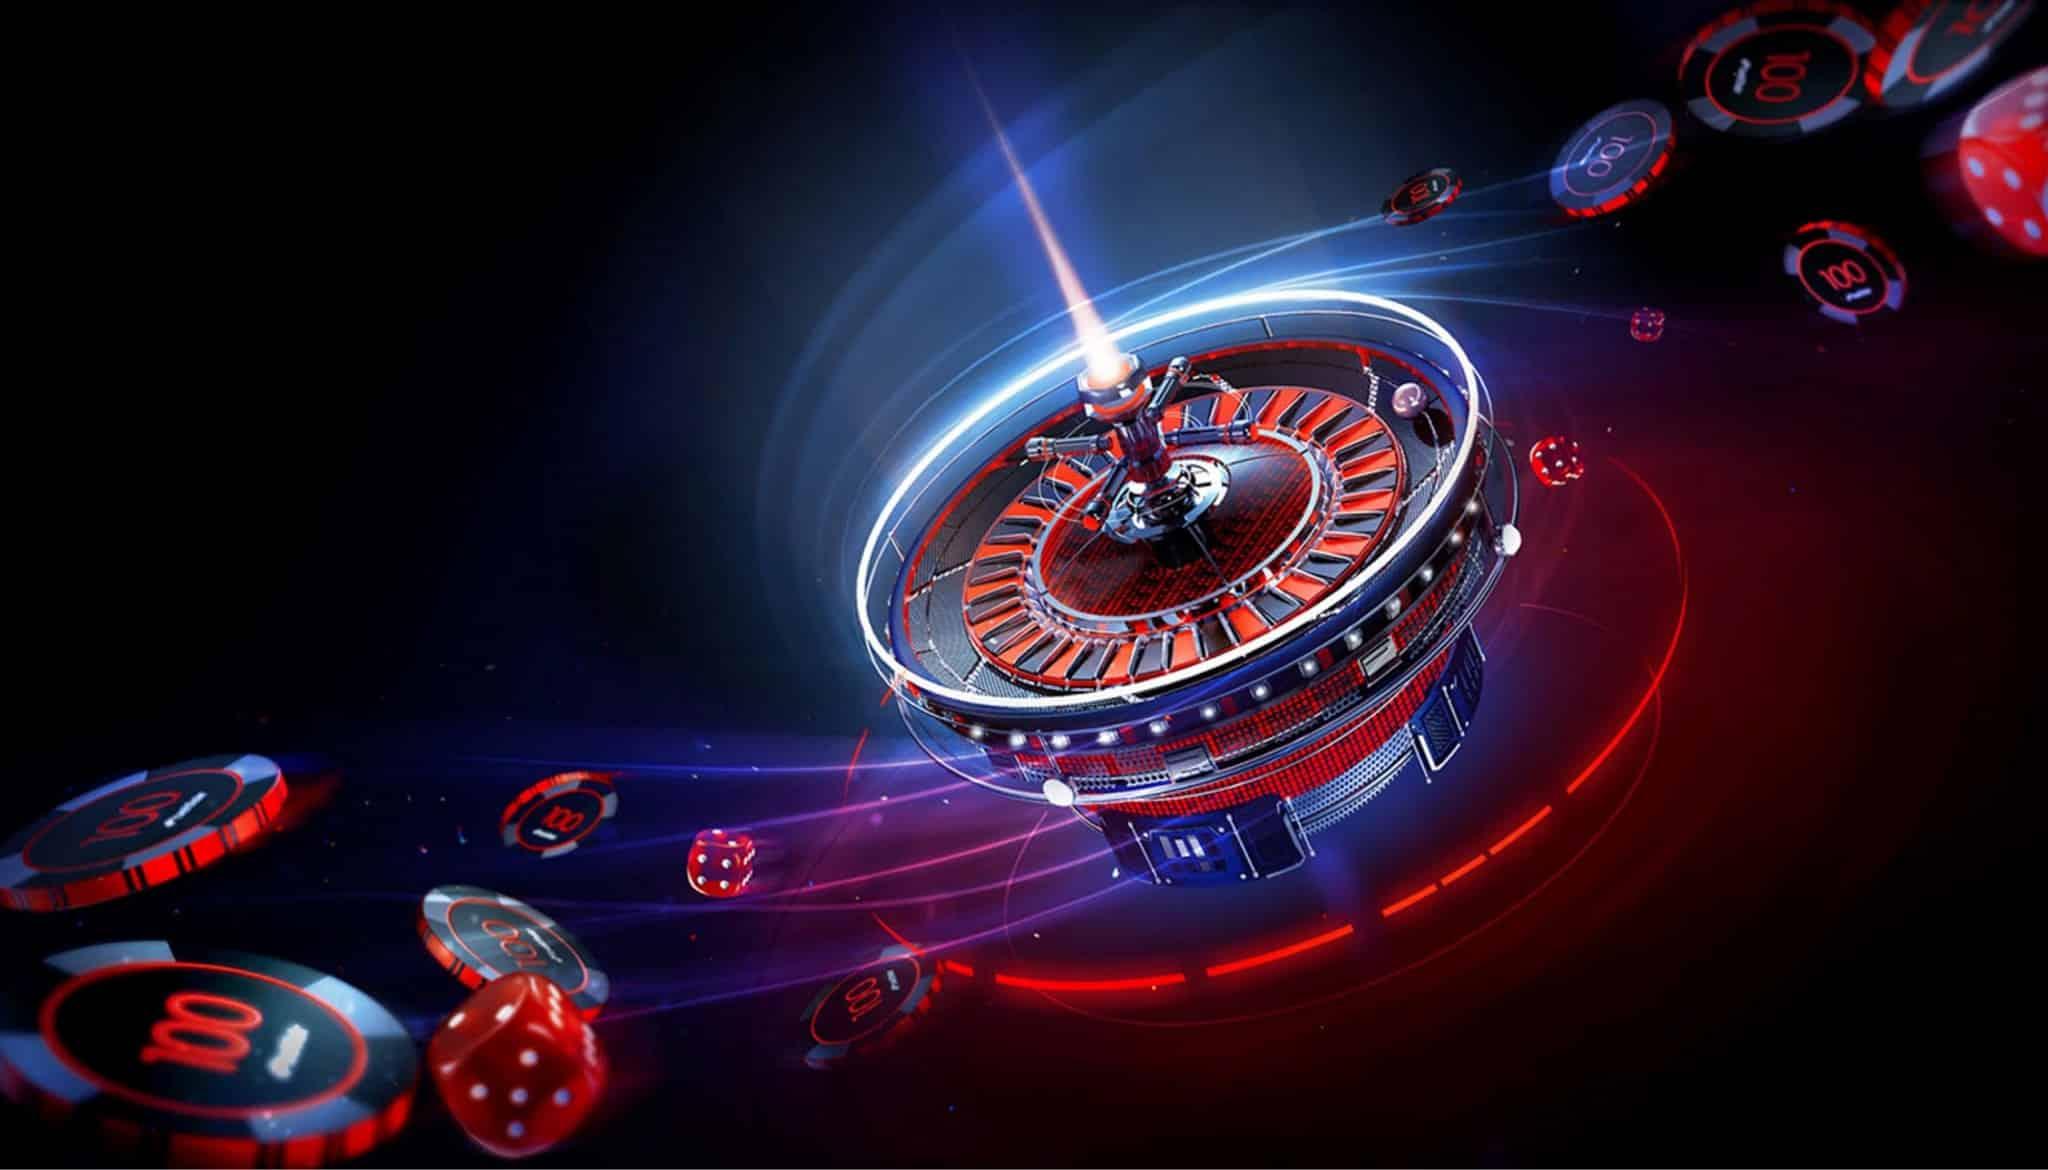 Ruleta Futurista scaled Funcionamiento de la ruleta electrónica de casino